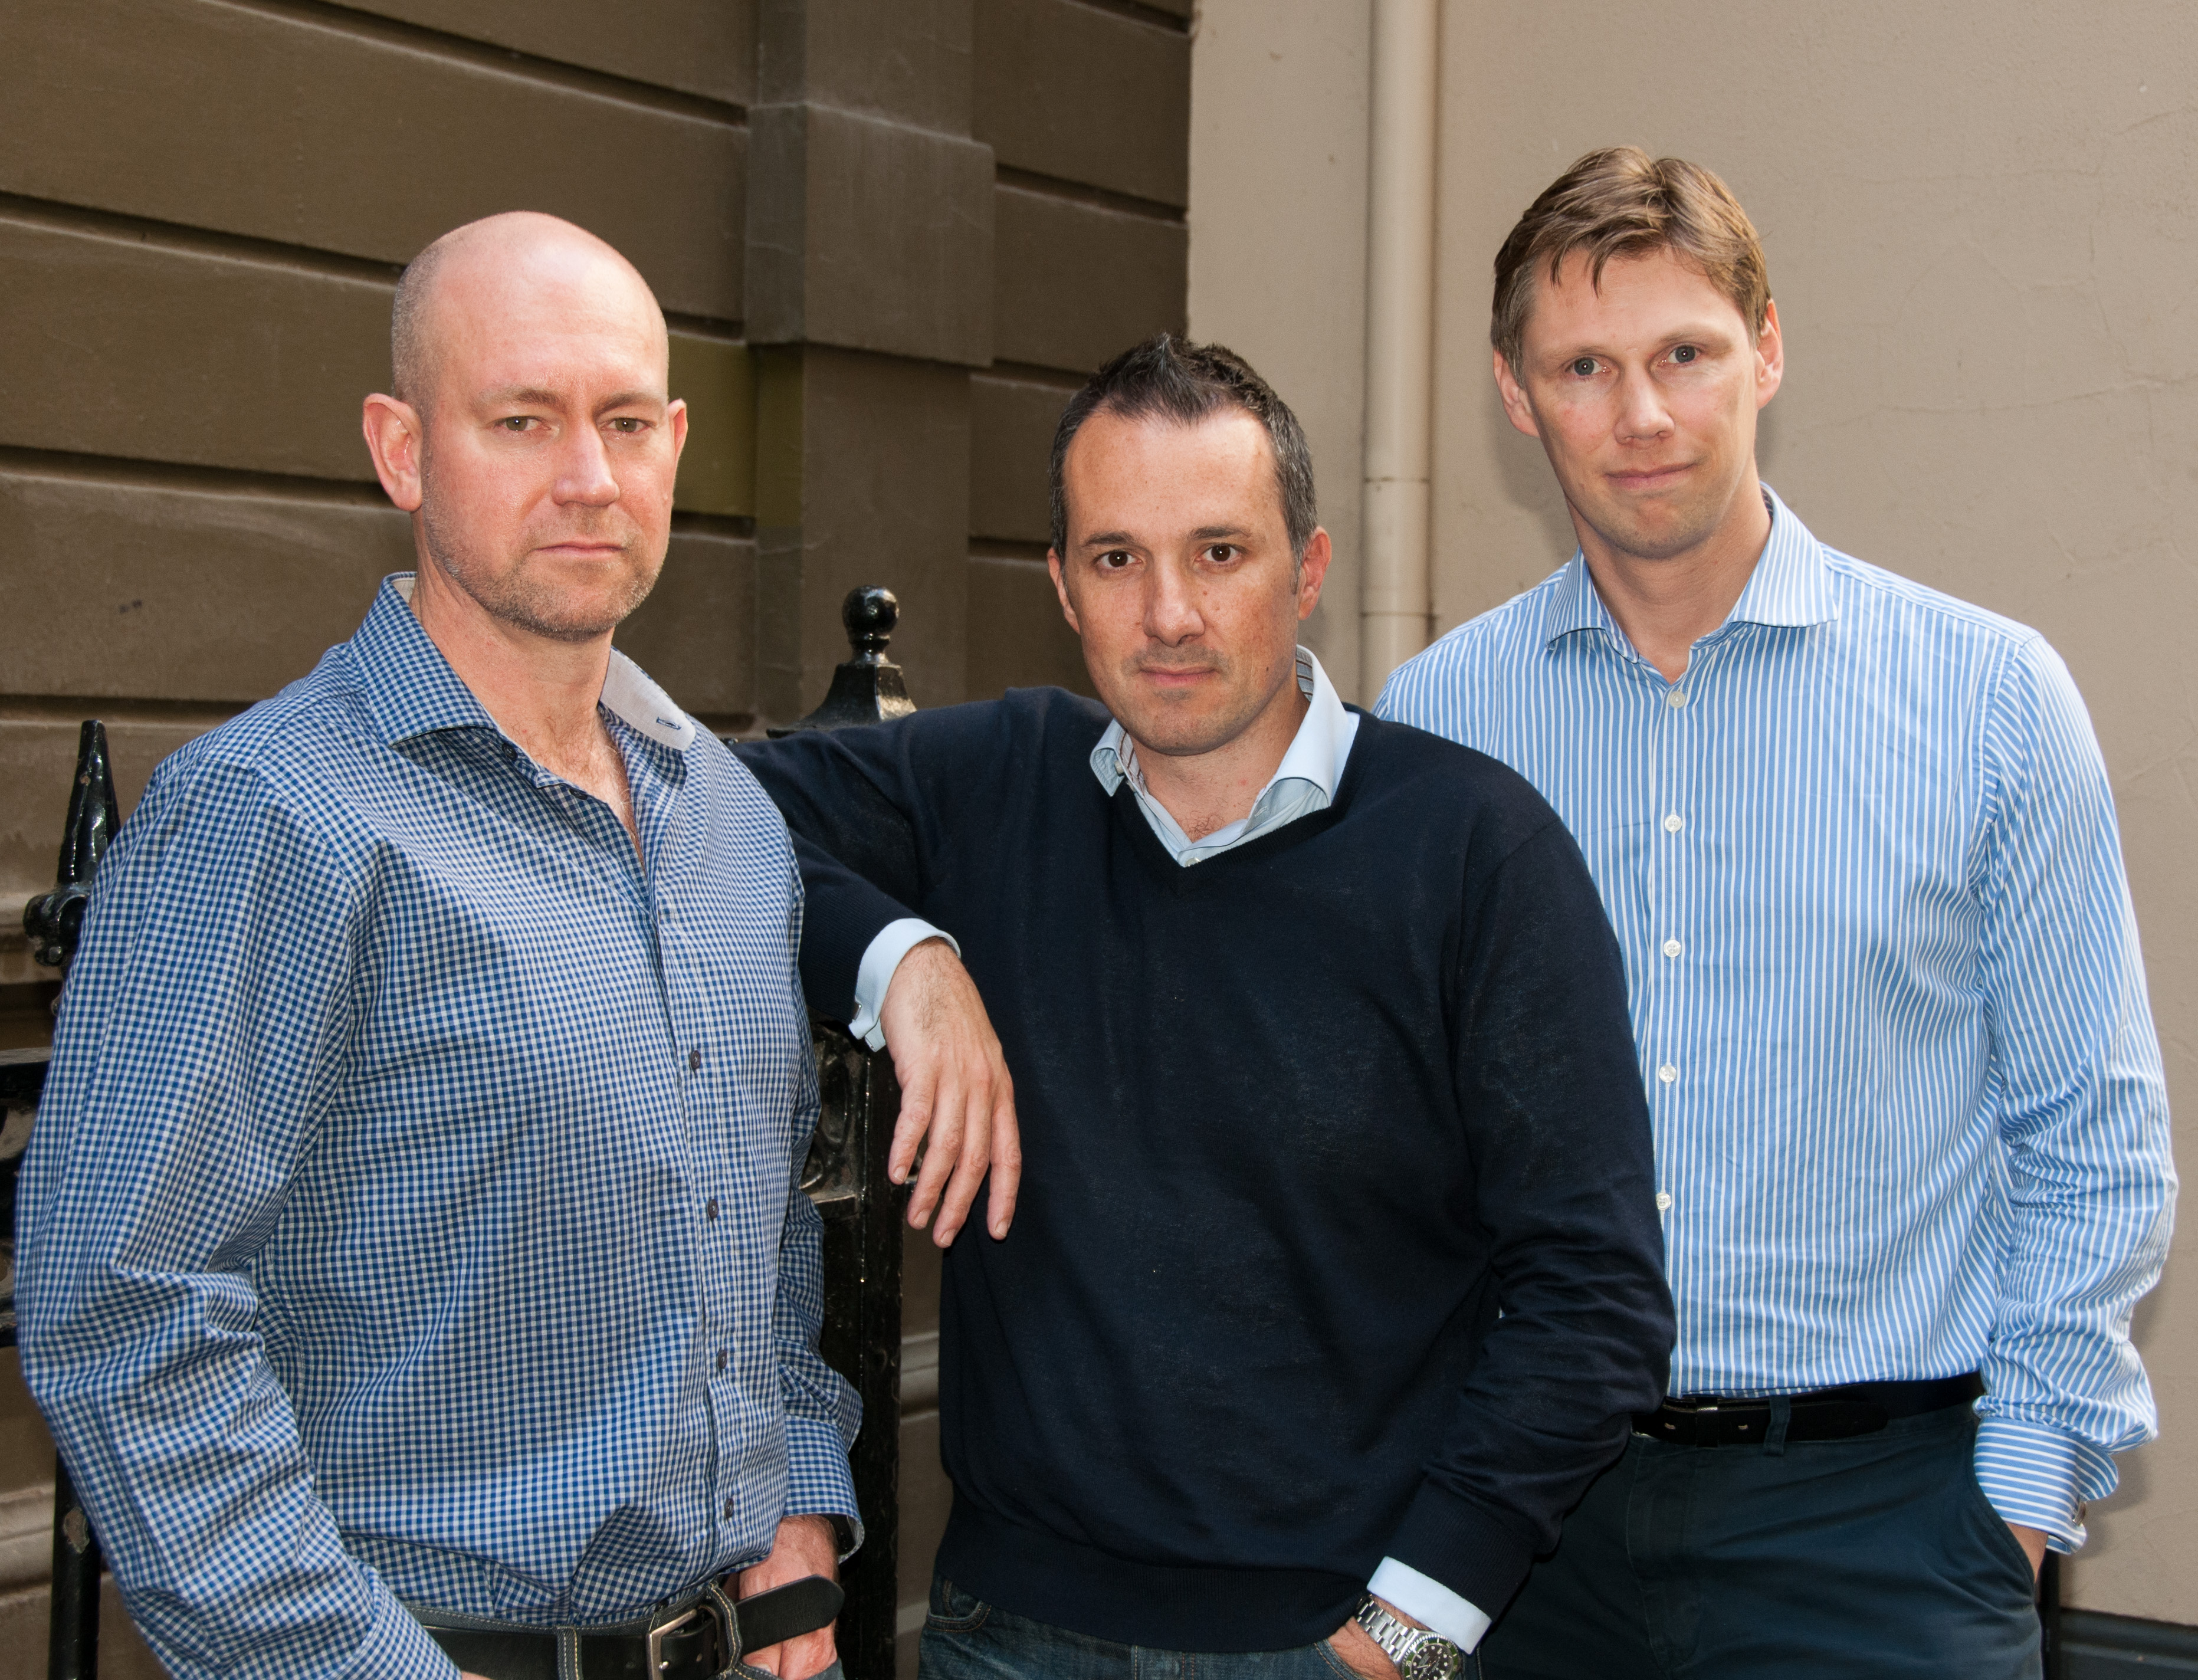 Moula COO Andrew Watt, CEO Aris Allegos and CTO Piers Moller